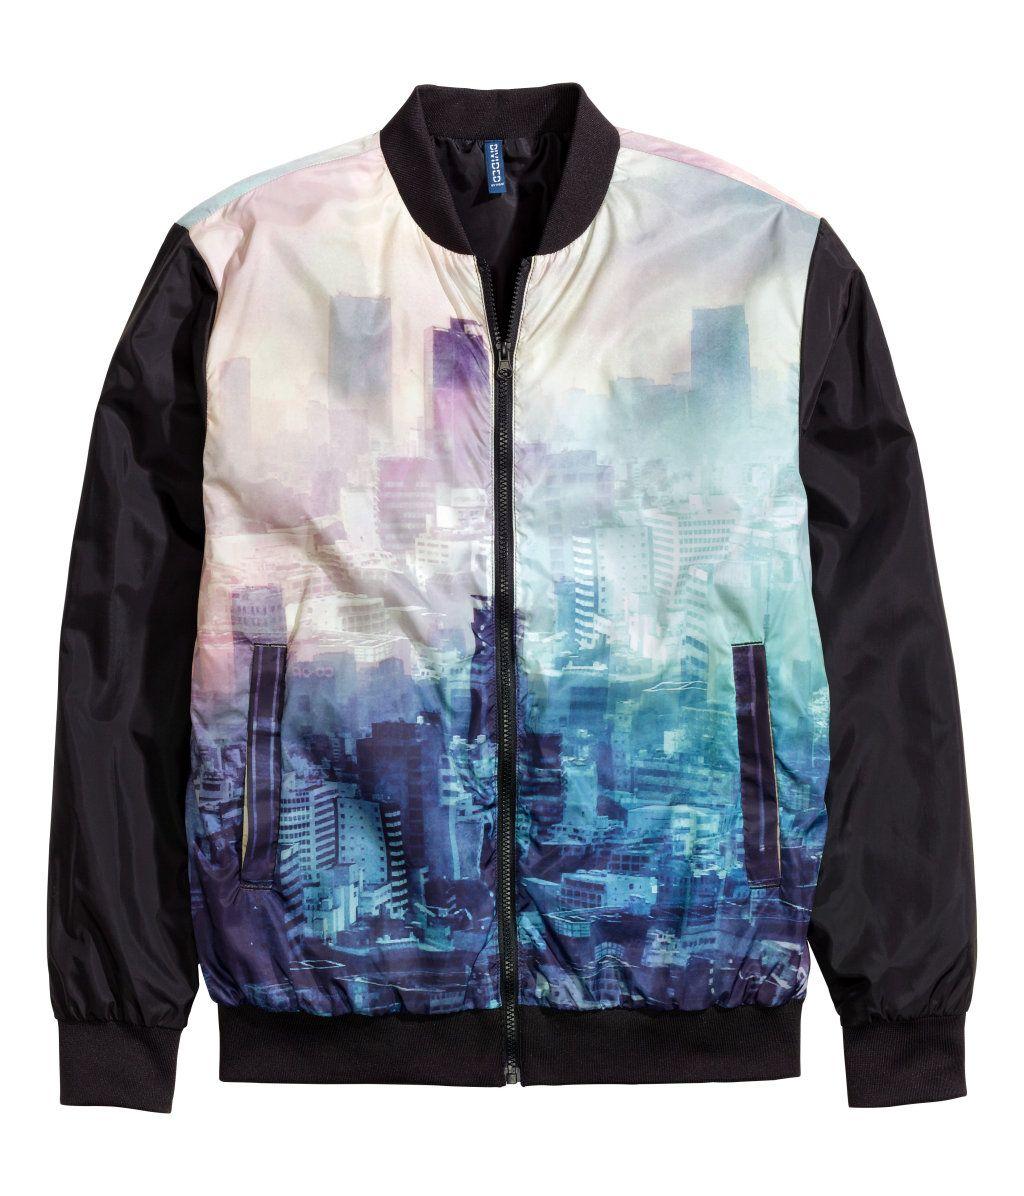 H&M pilot jacket Leather jacket men, Brown leather